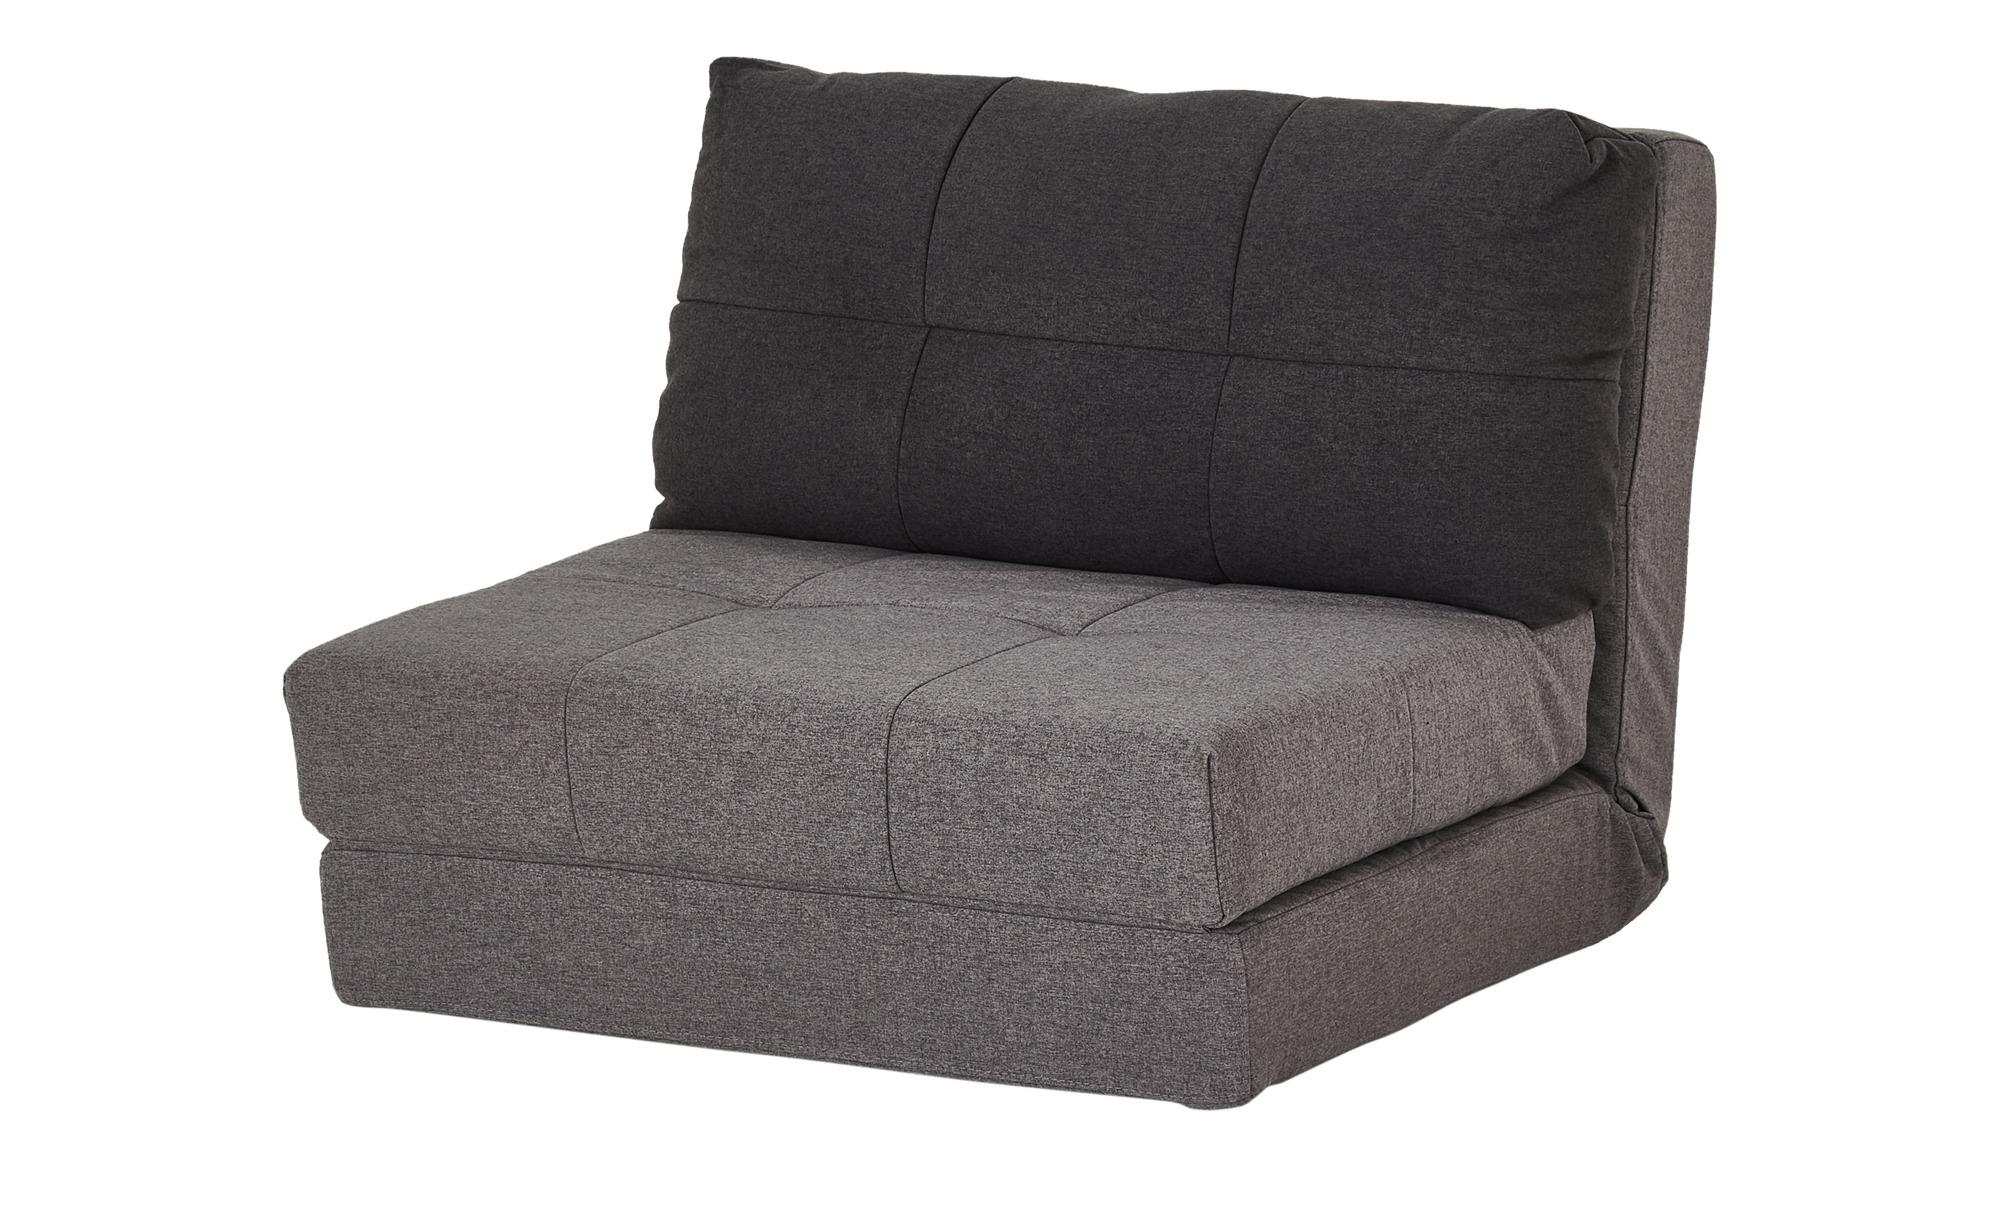 Schlafsessel  Becky ¦ grau ¦ Maße (cm): B: 90 H: 72 T: 80 Polstermöbel > Sessel > Schlafsessel - Höffner